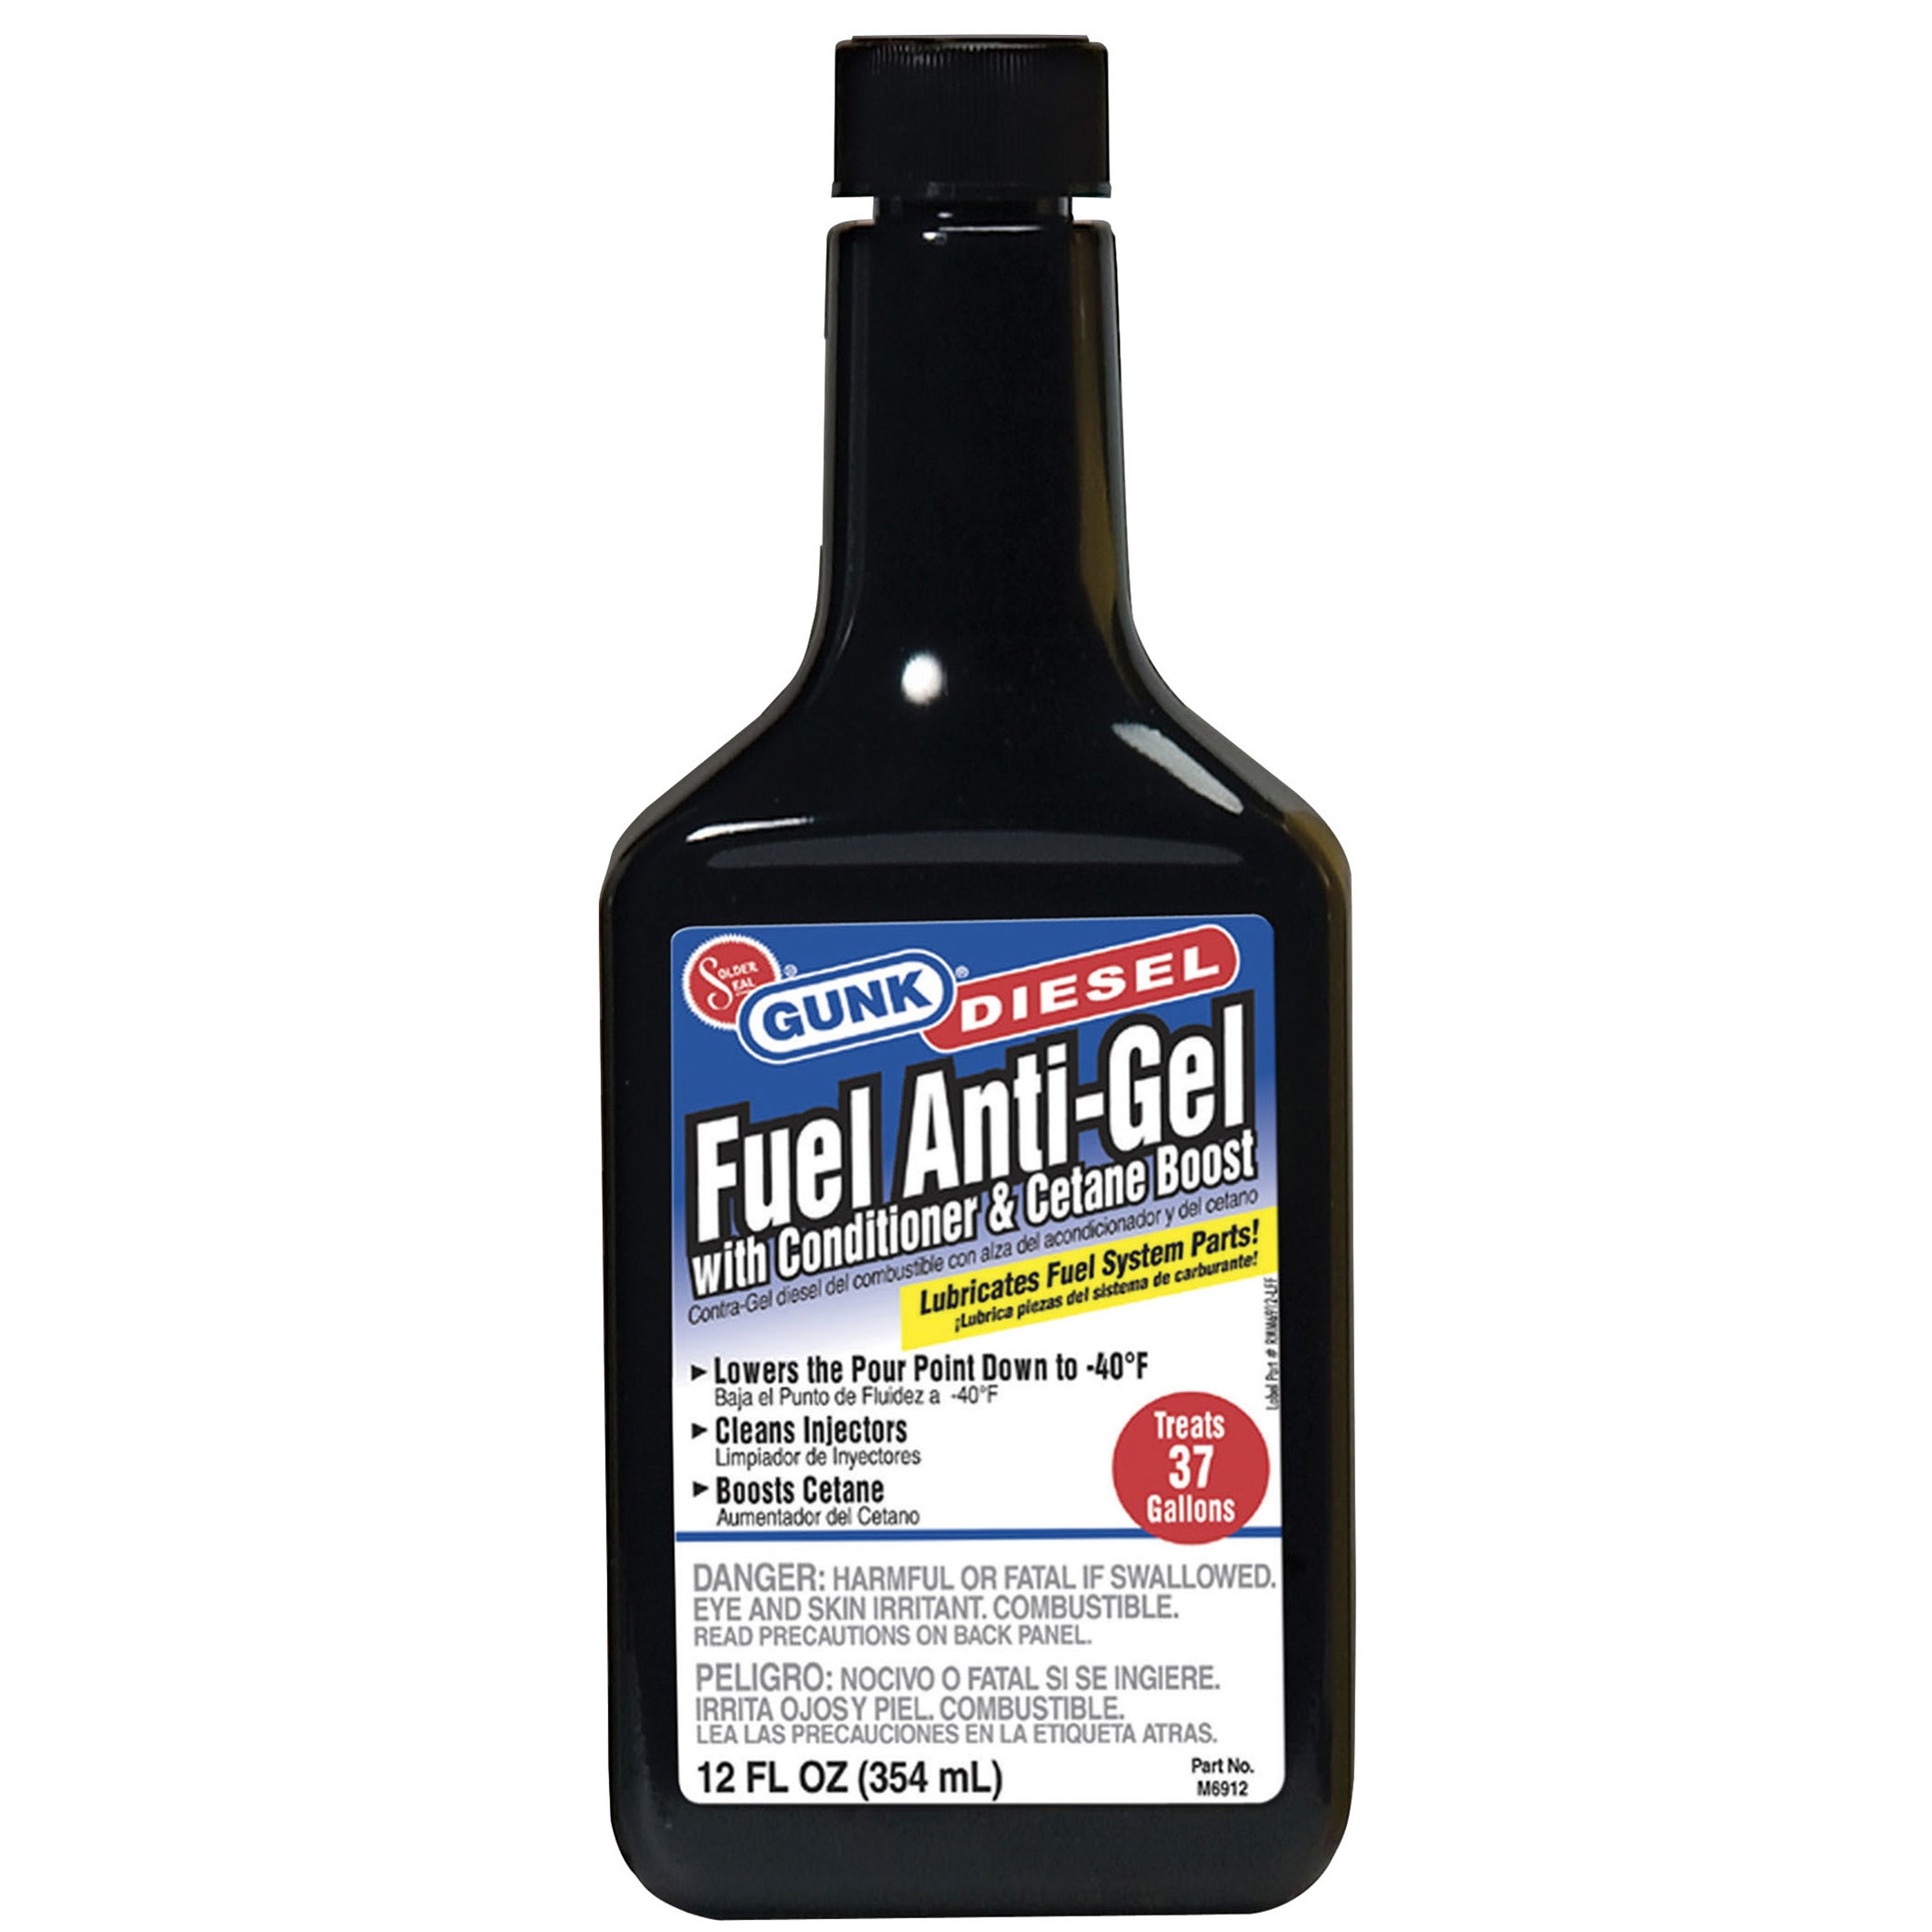 Gunk M6912 12 Oz Diesel Fuel Anti-Gel (Car care/cleaning)...